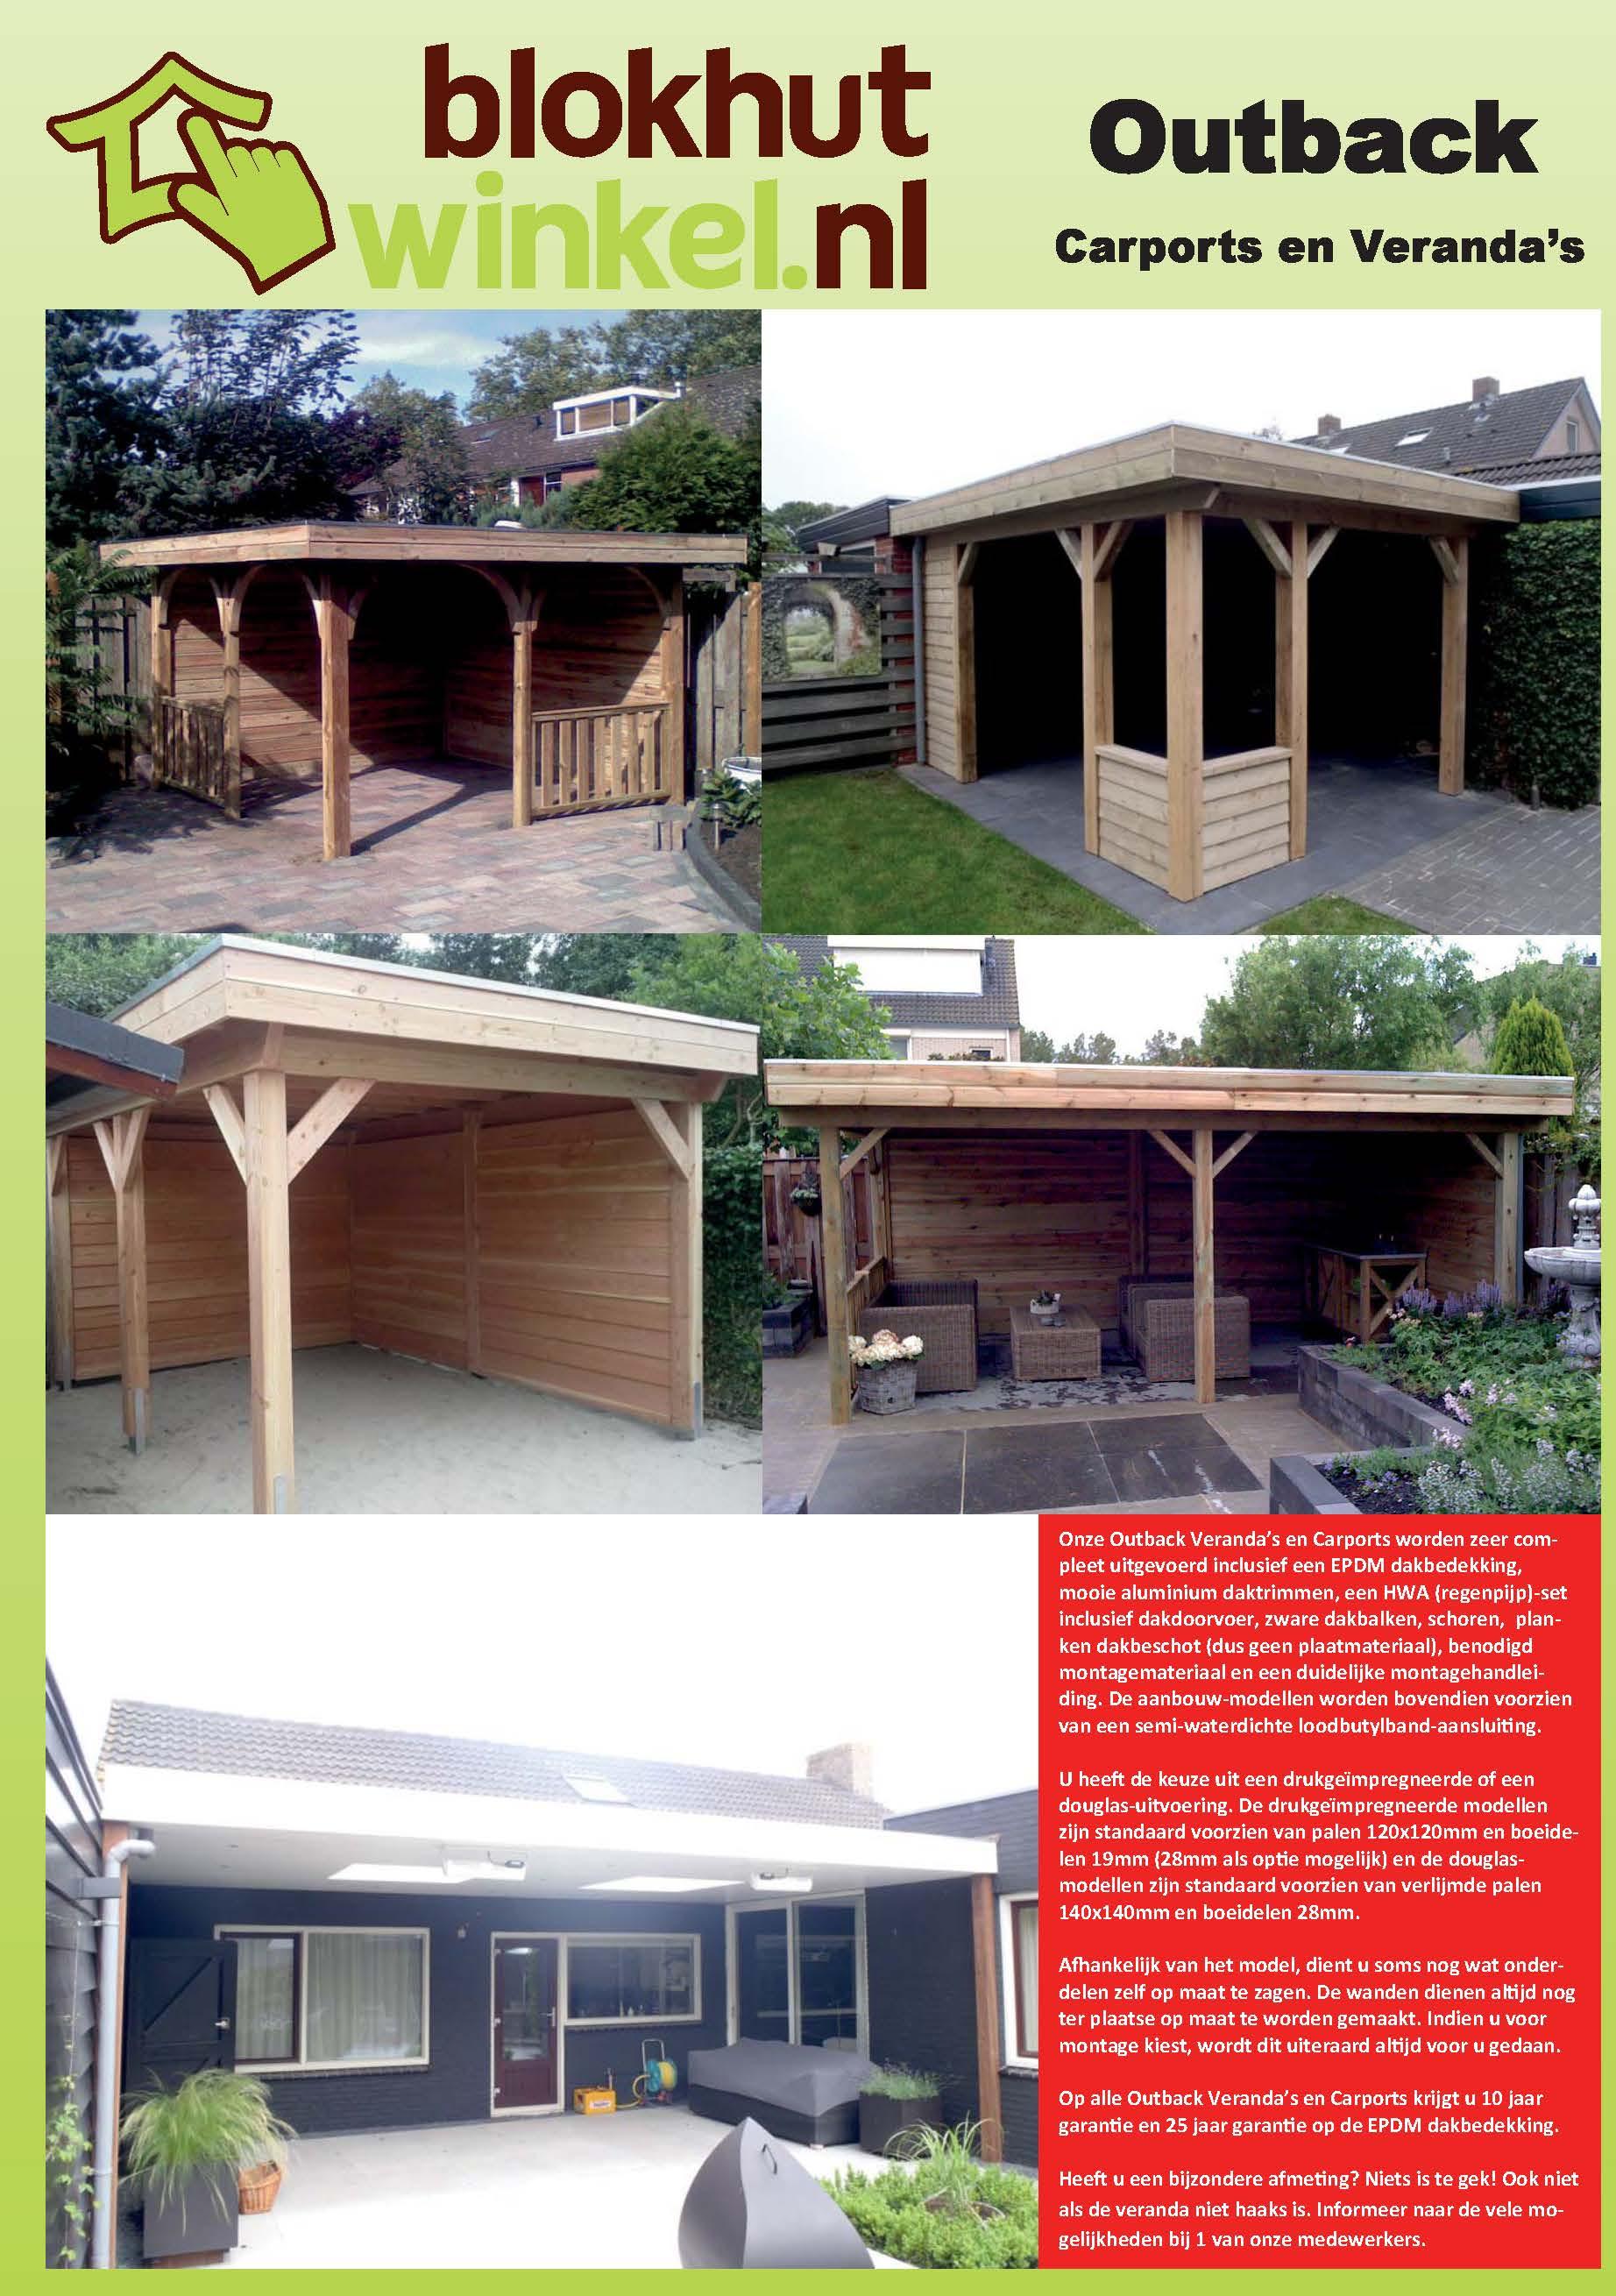 Outback houten overkappingen flyer 2017 pagina 2